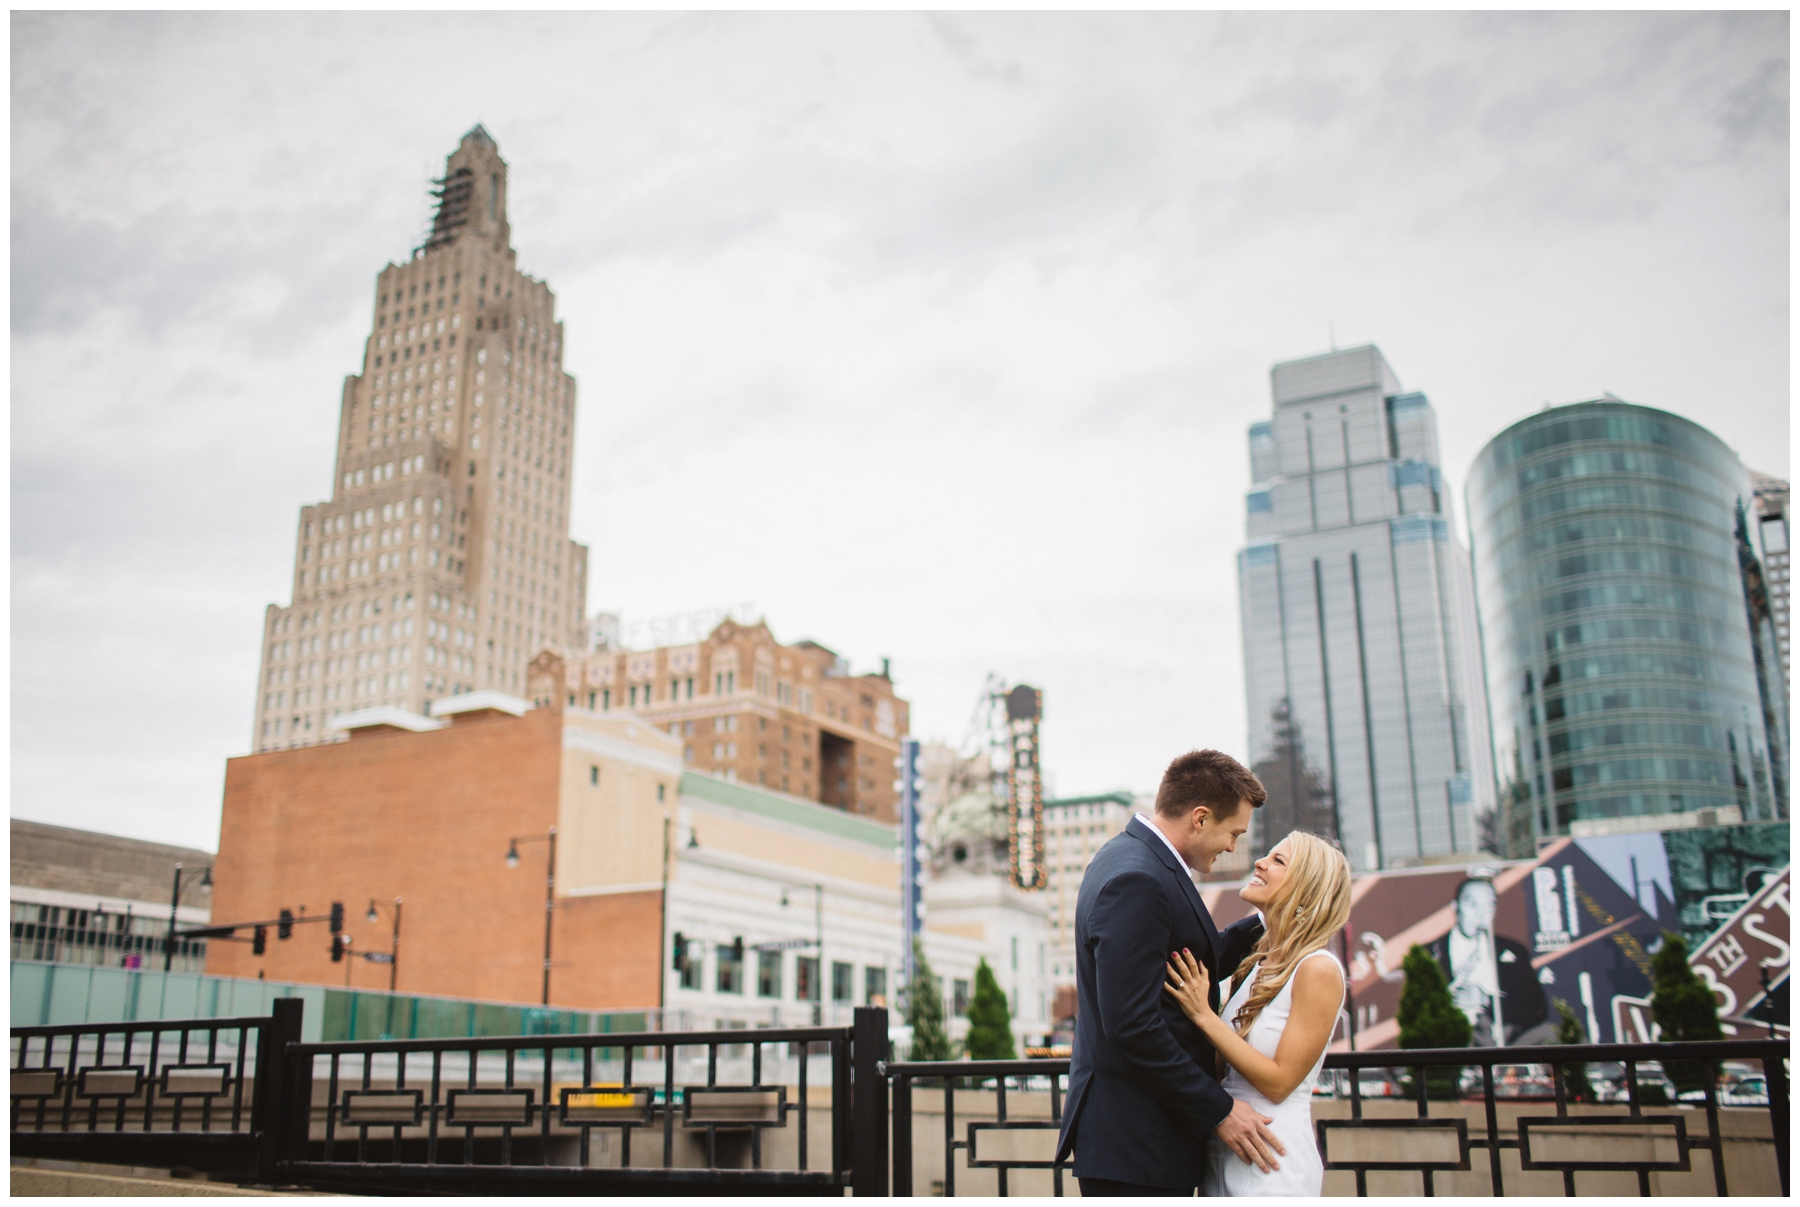 allison-corrin-kansas-city-engagement-wedding-photographer_0007.jpg